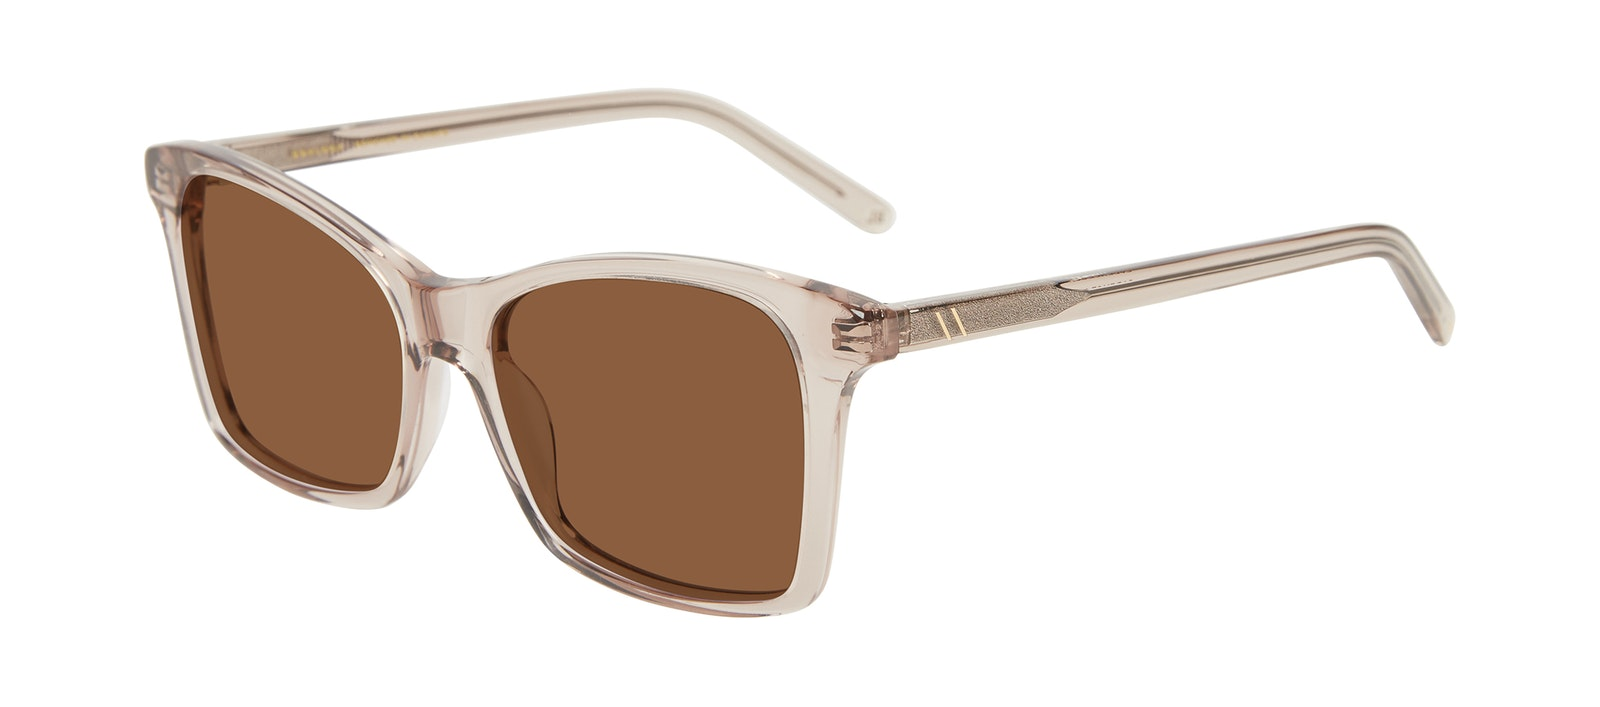 Affordable Fashion Glasses Square Sunglasses Women Cadence Sand Tilt